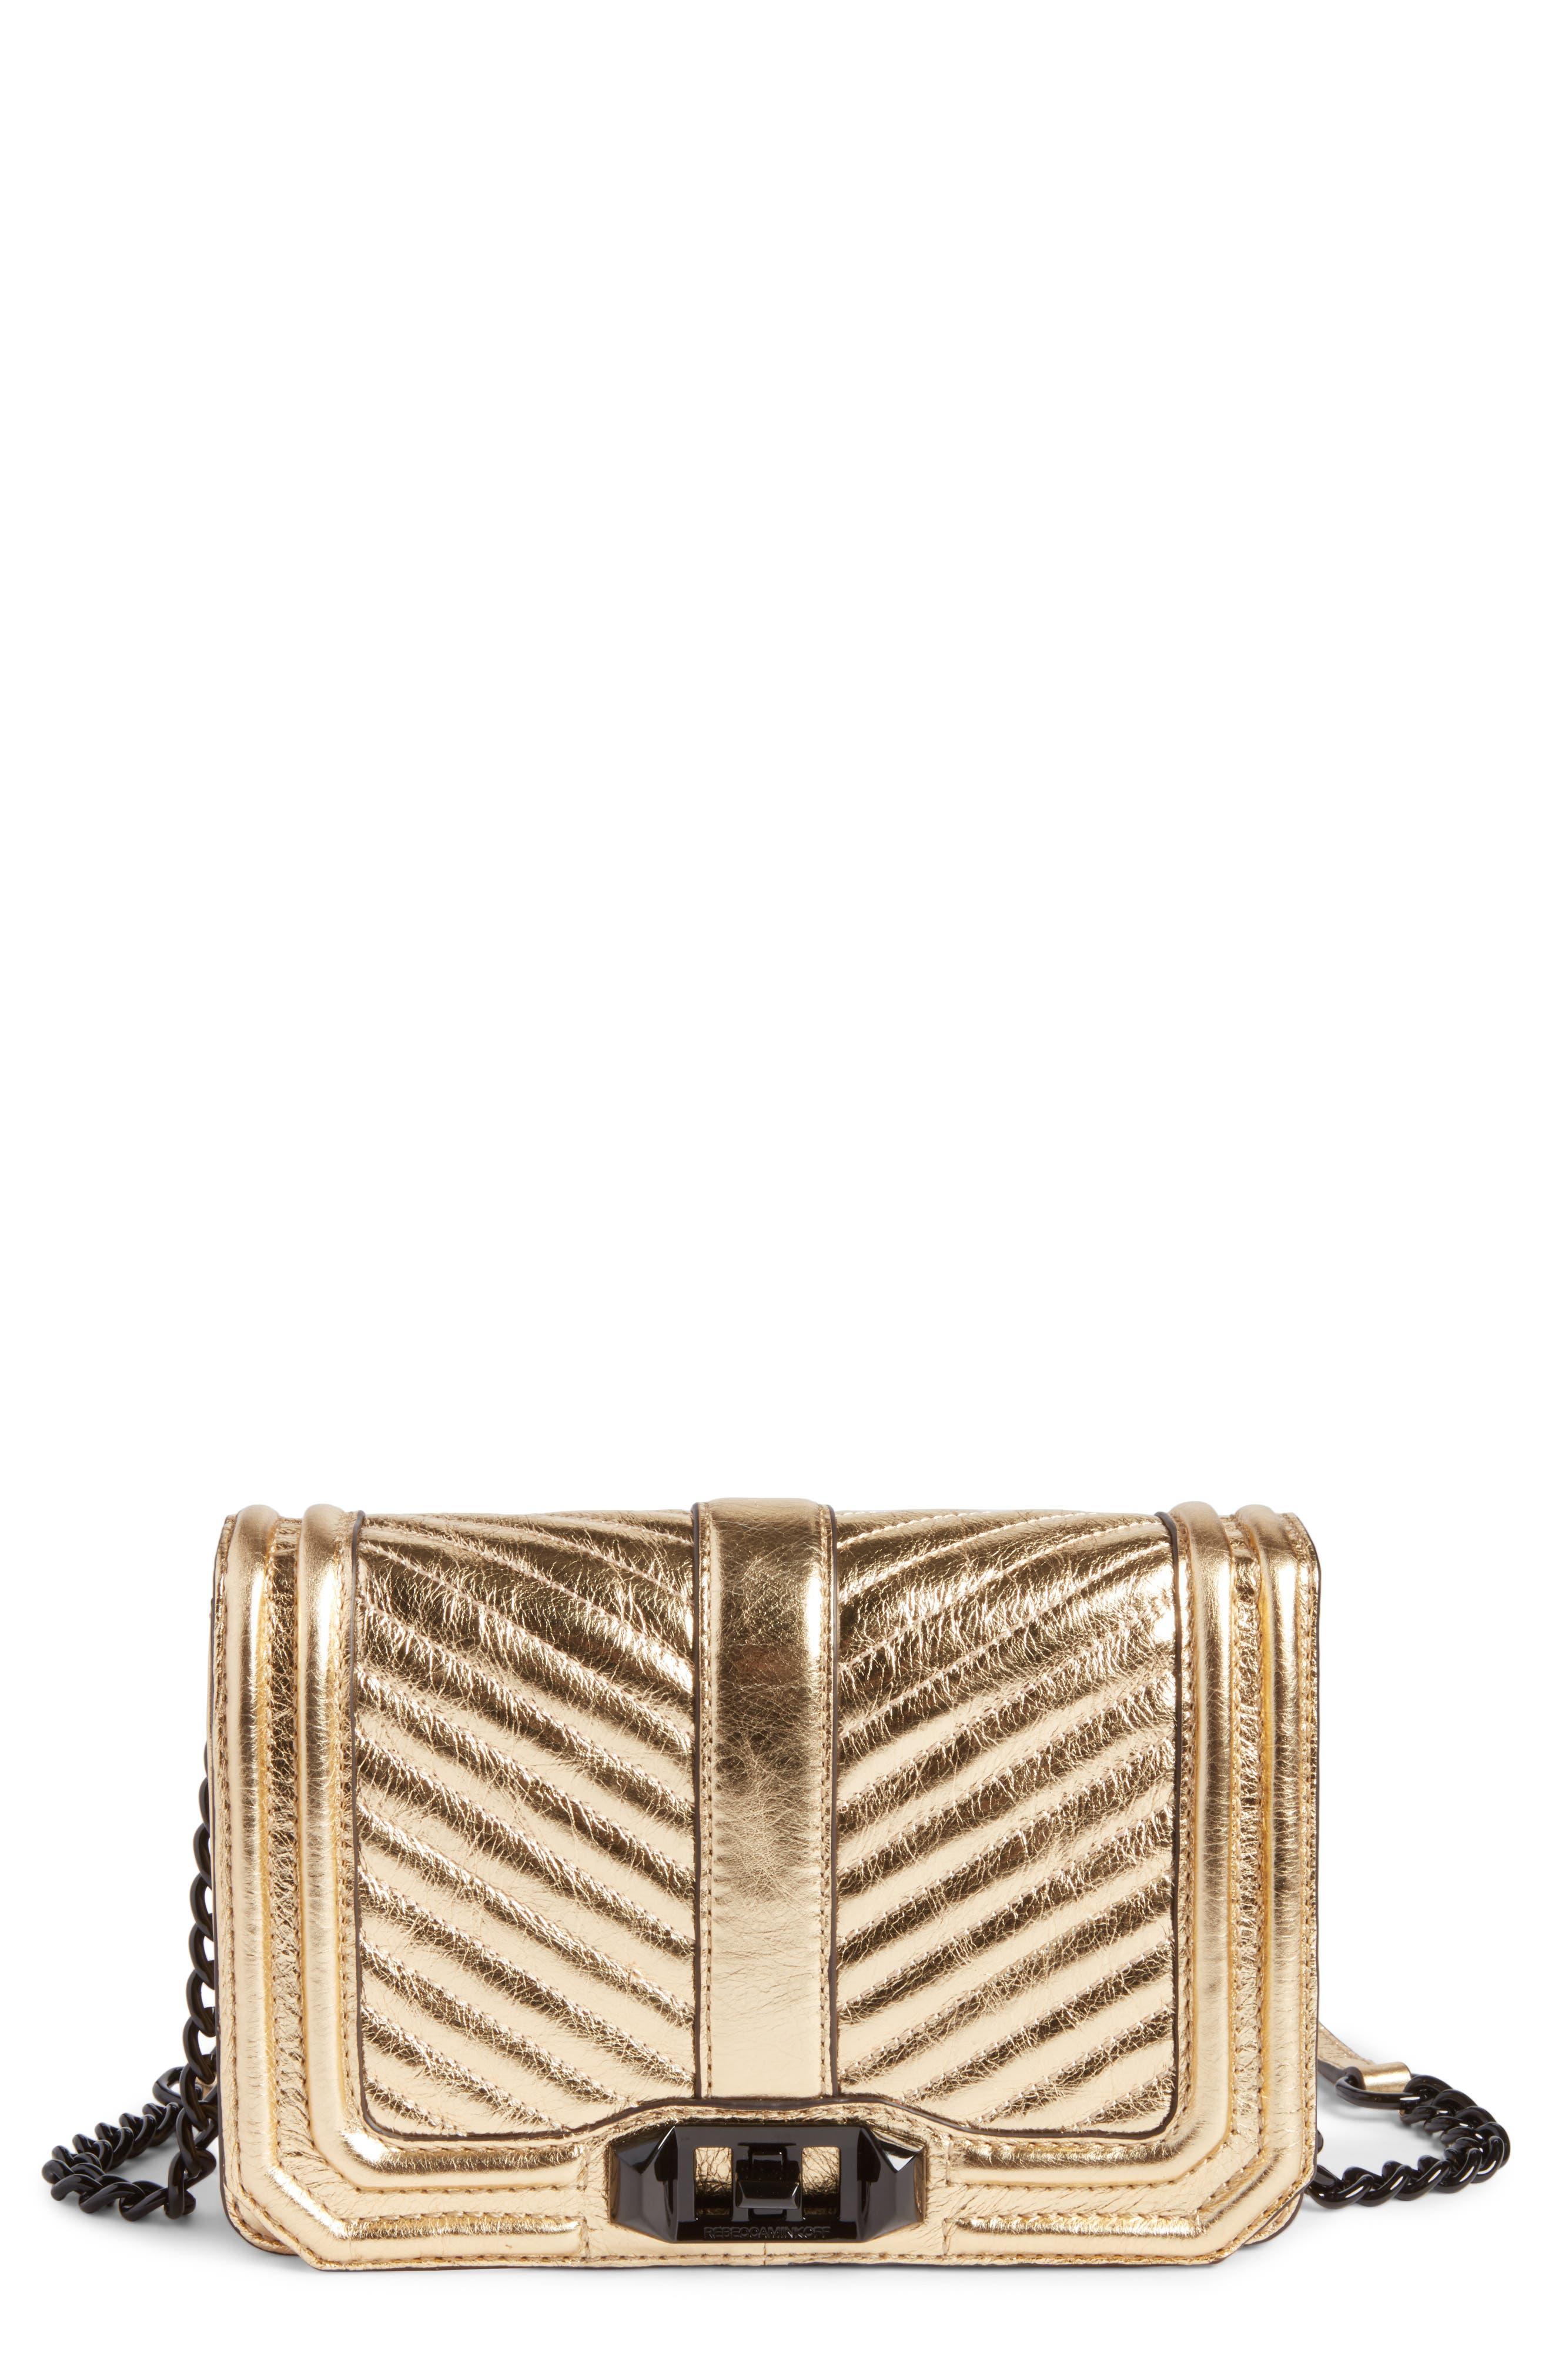 Rebecca Minkoff Small Love Metallic Leather Crossbody Bag (Nordstrom Exclusive)